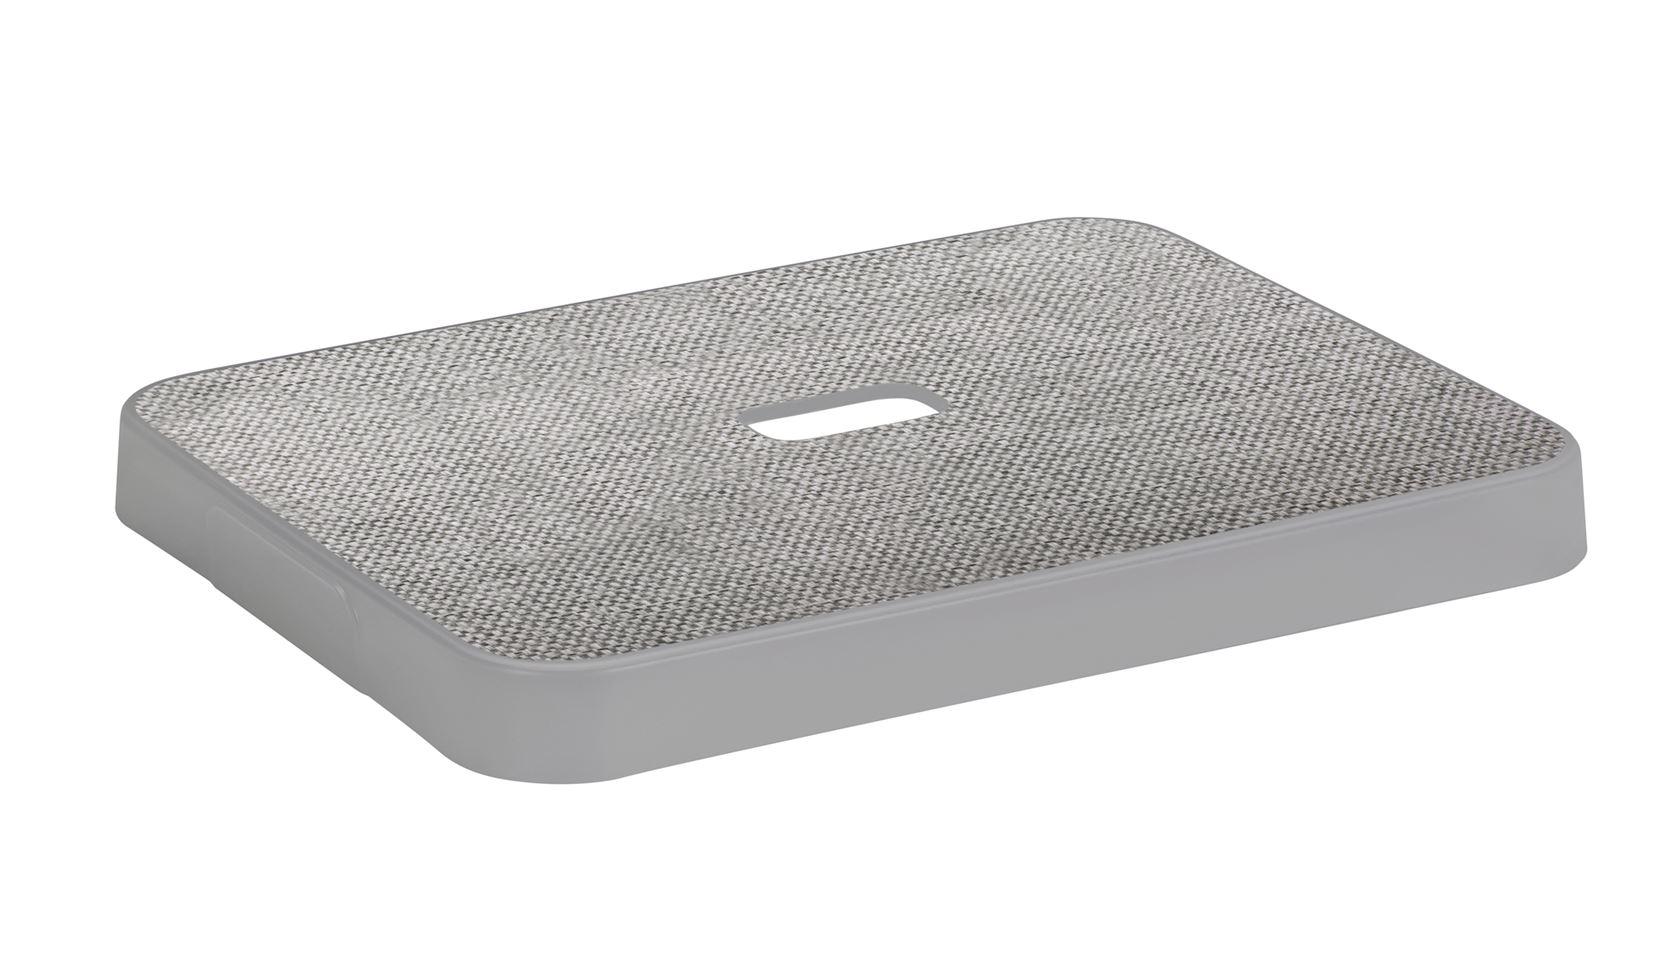 sunware-sigma-home-deksel-voor-box-24-of-32-ltr-stof-lichtgrijs